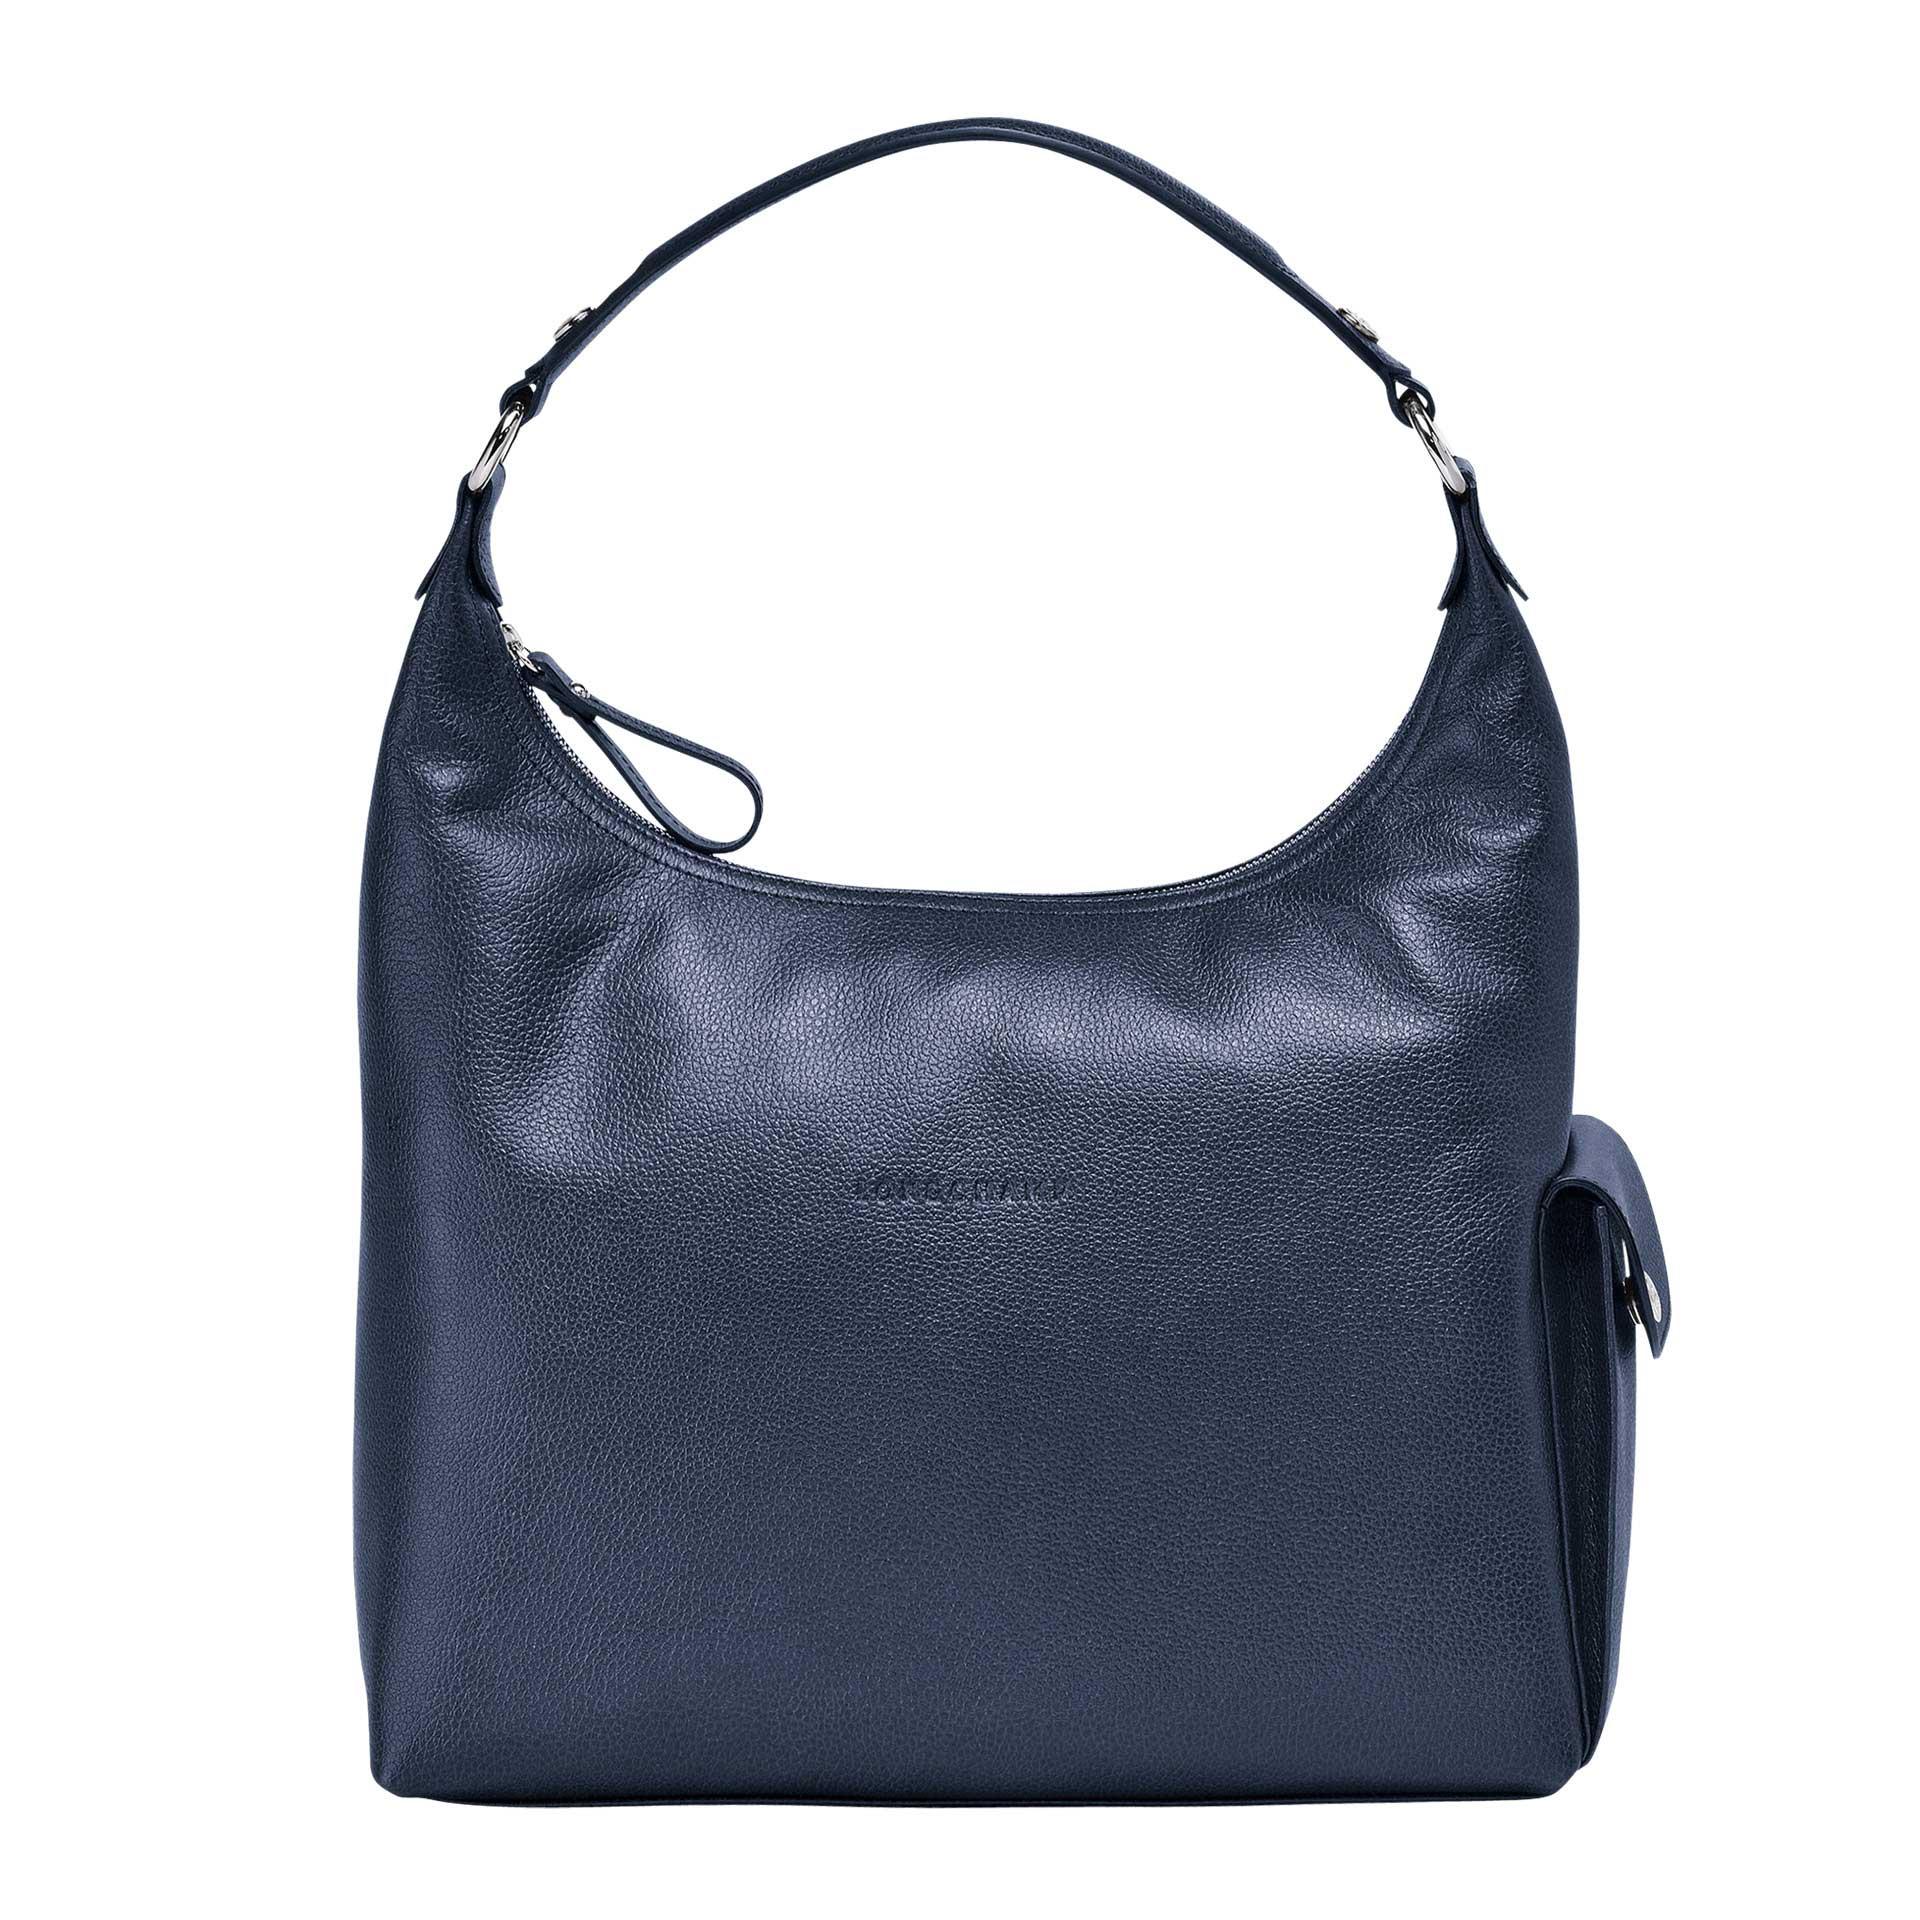 Longchamp Le Foulonné Hobo Bag navy